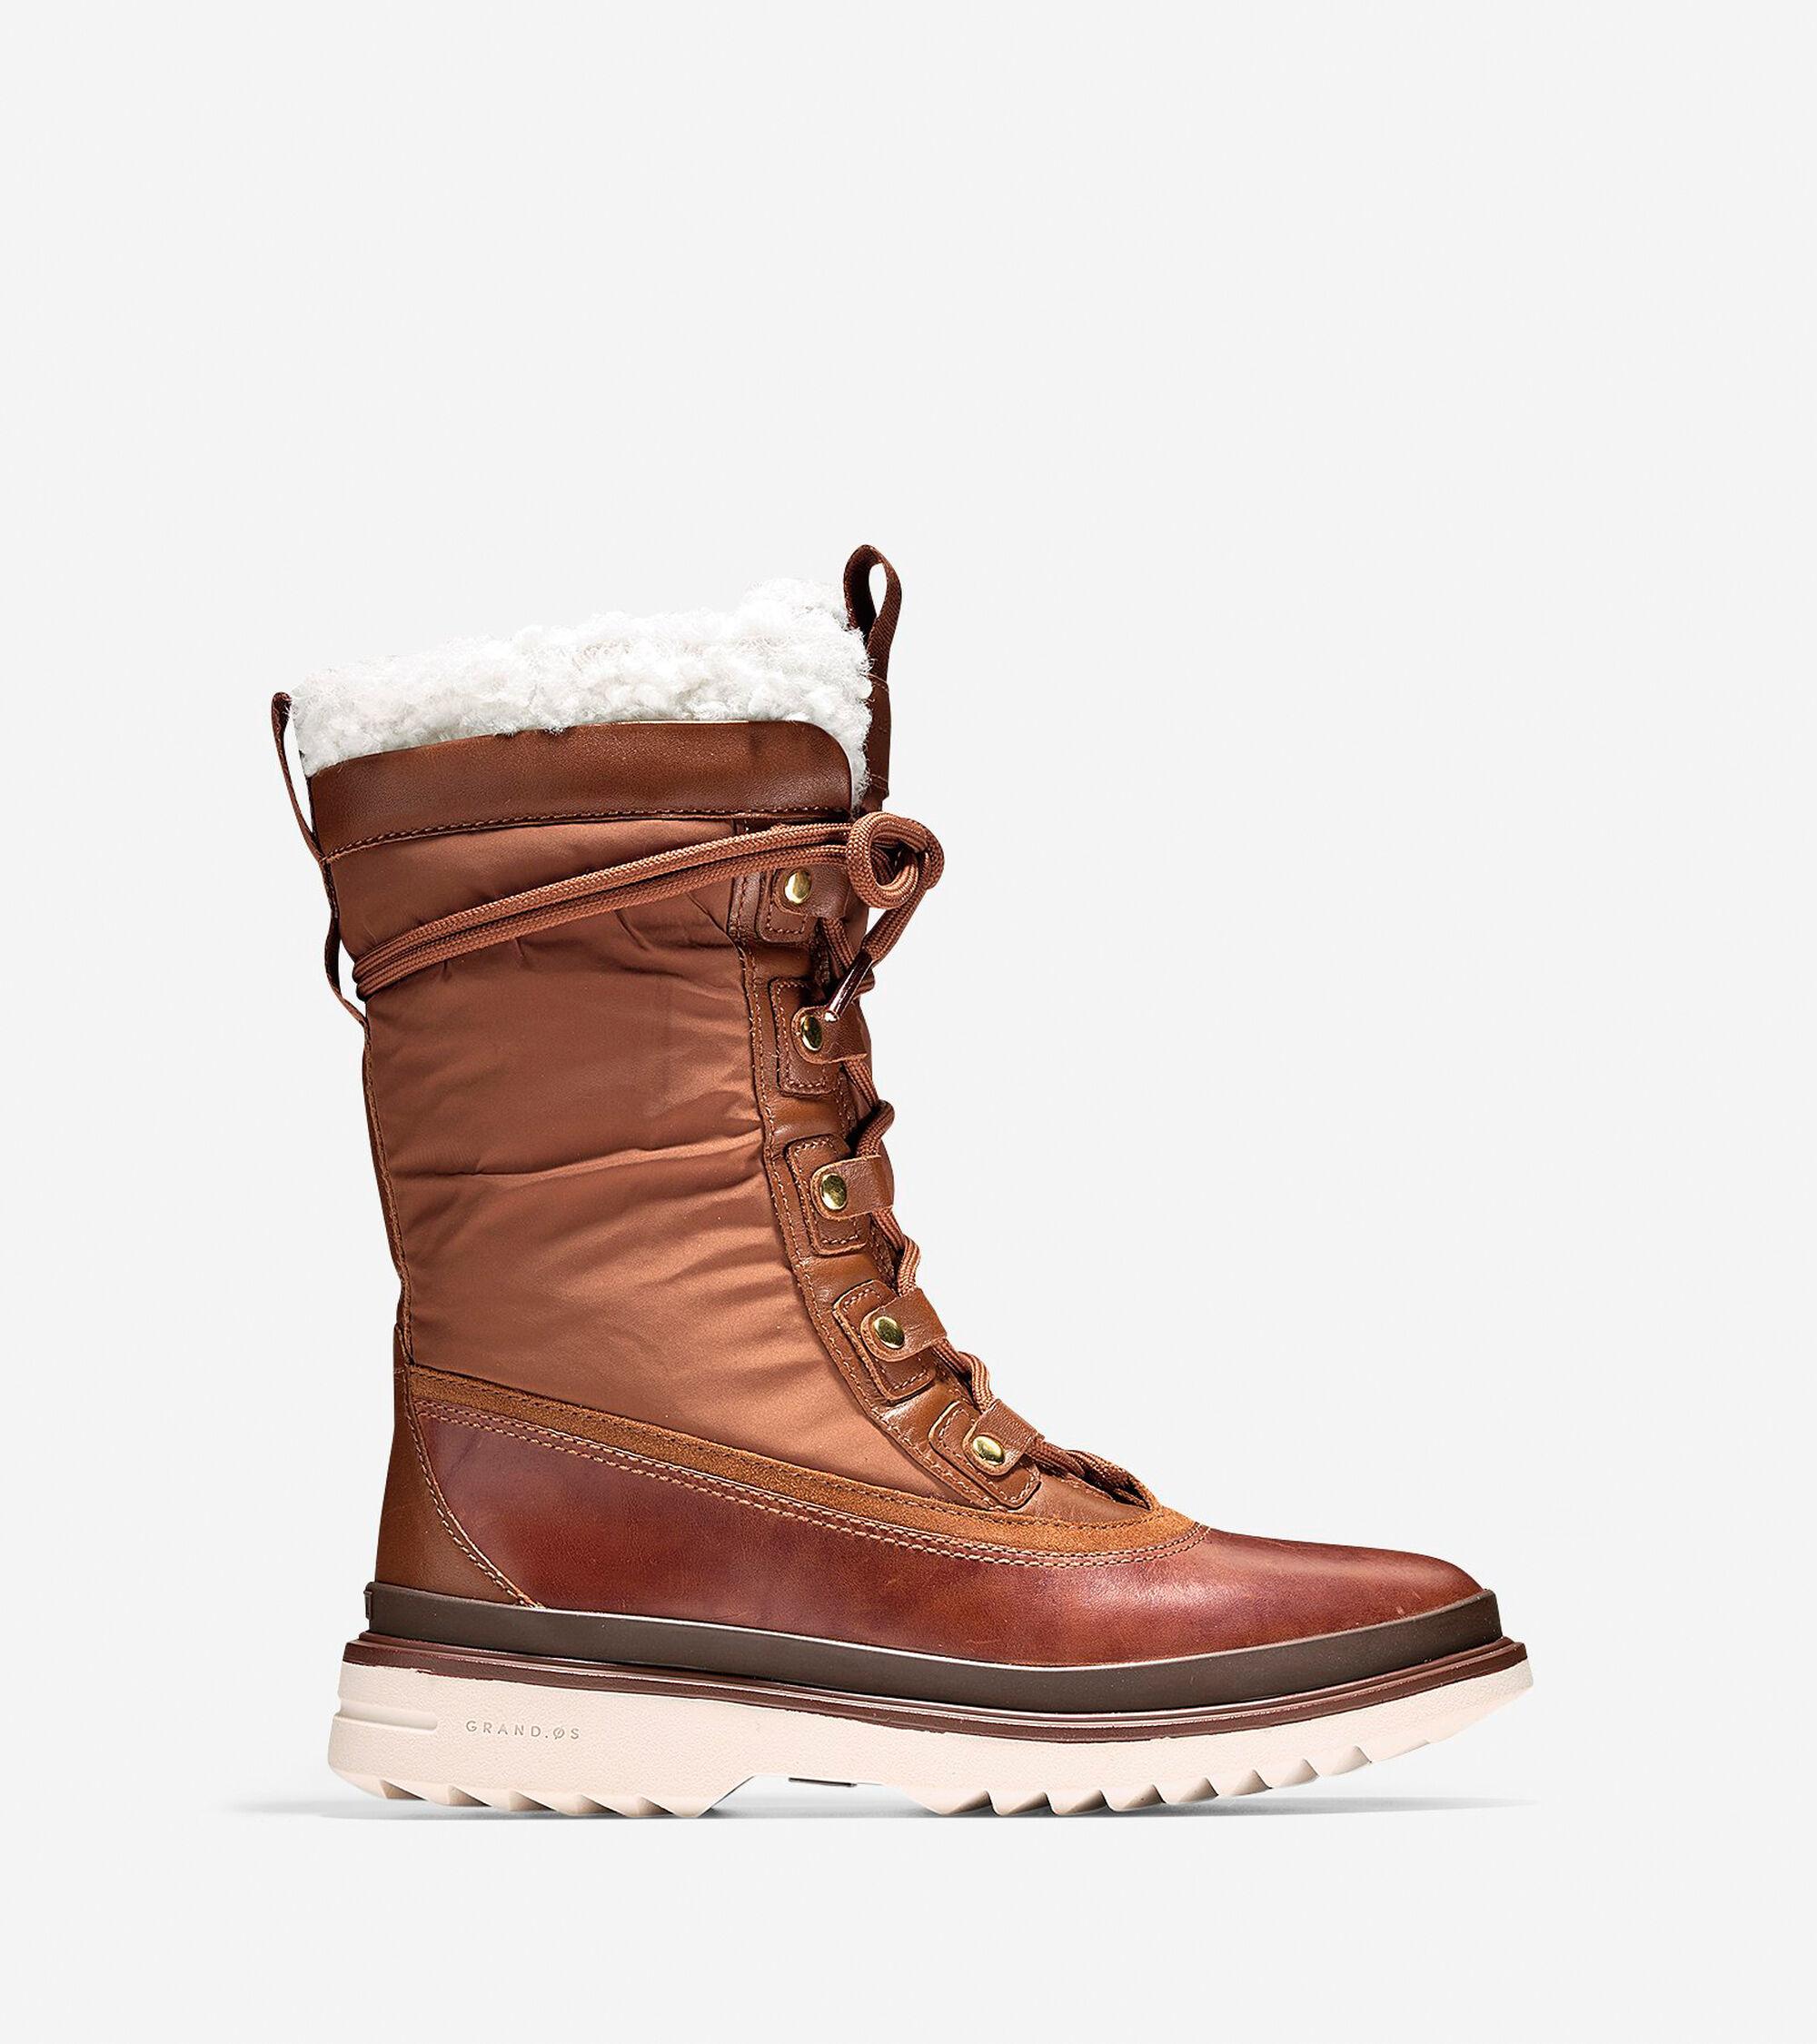 Cole Haan Millbridge Waterproof Lace Up Boots